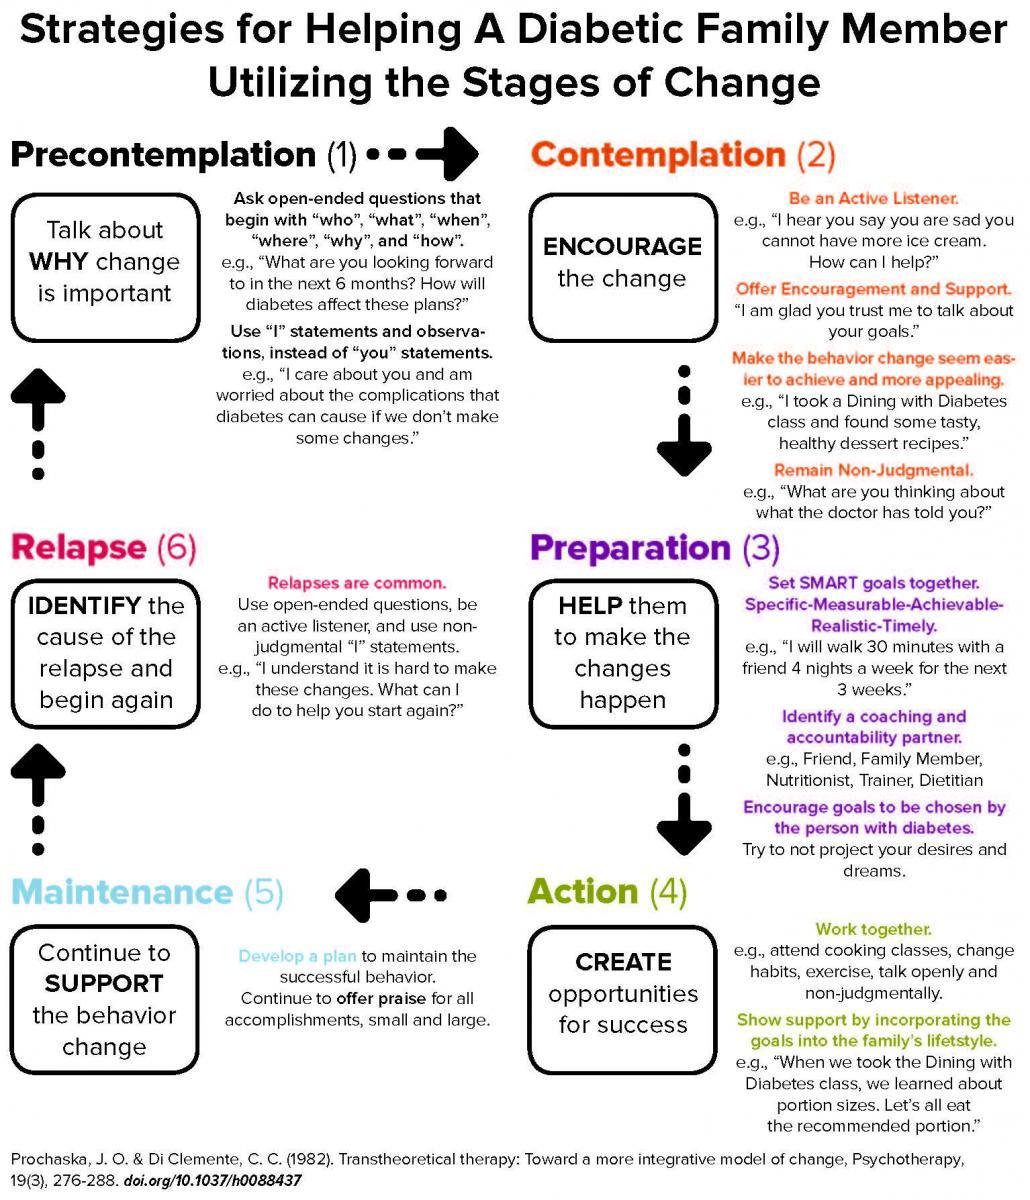 Strategies Flow Chart